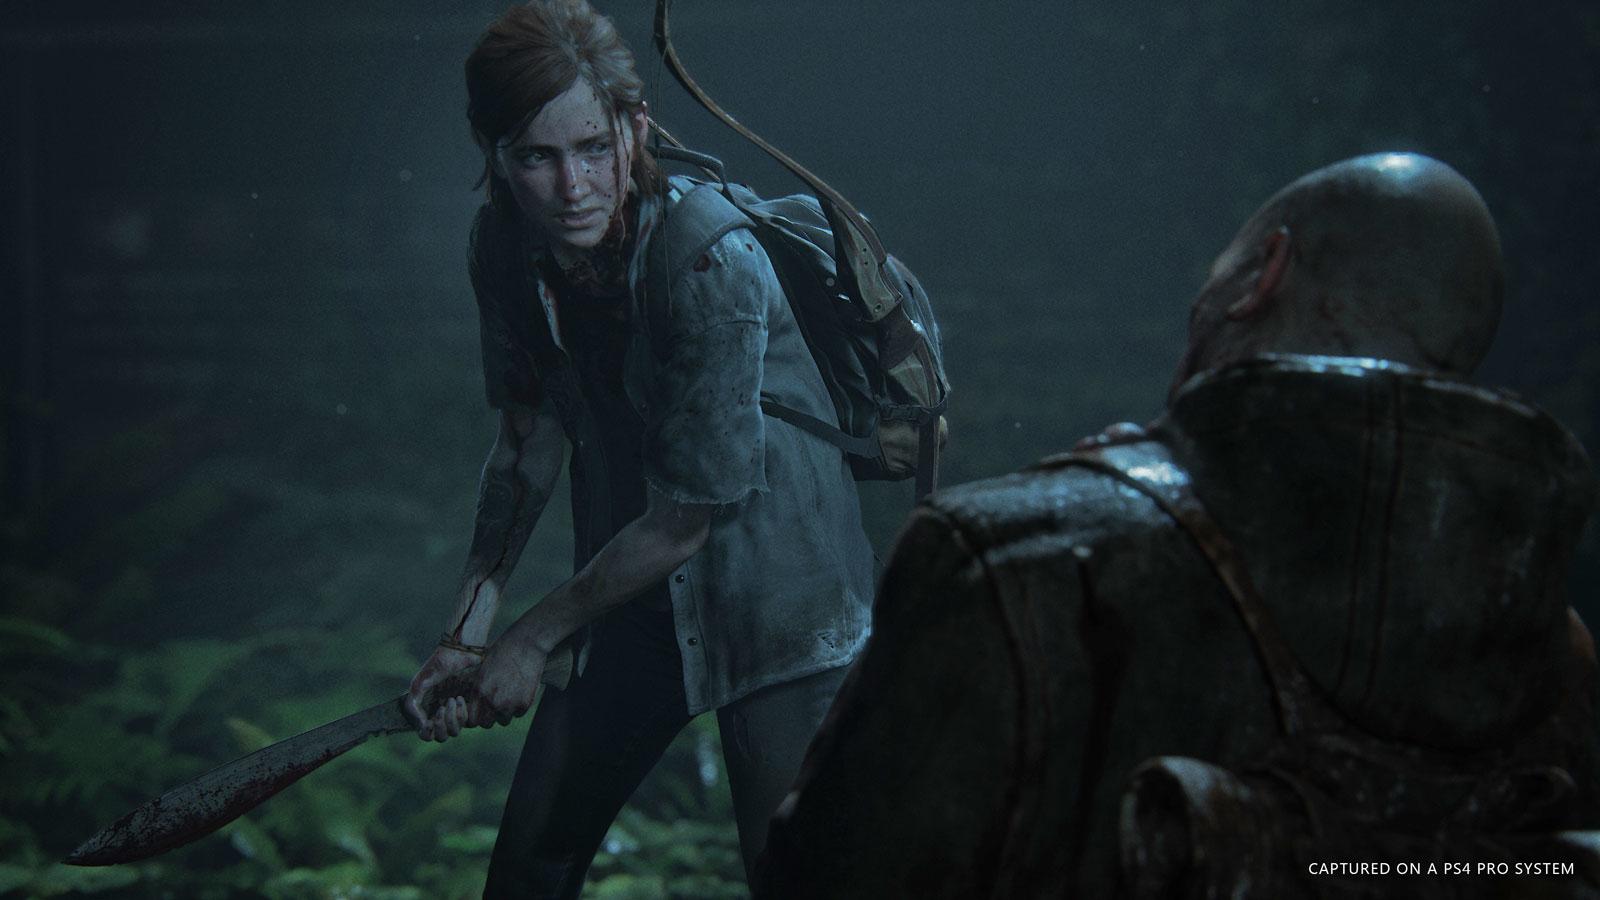 Sony Skipping E3